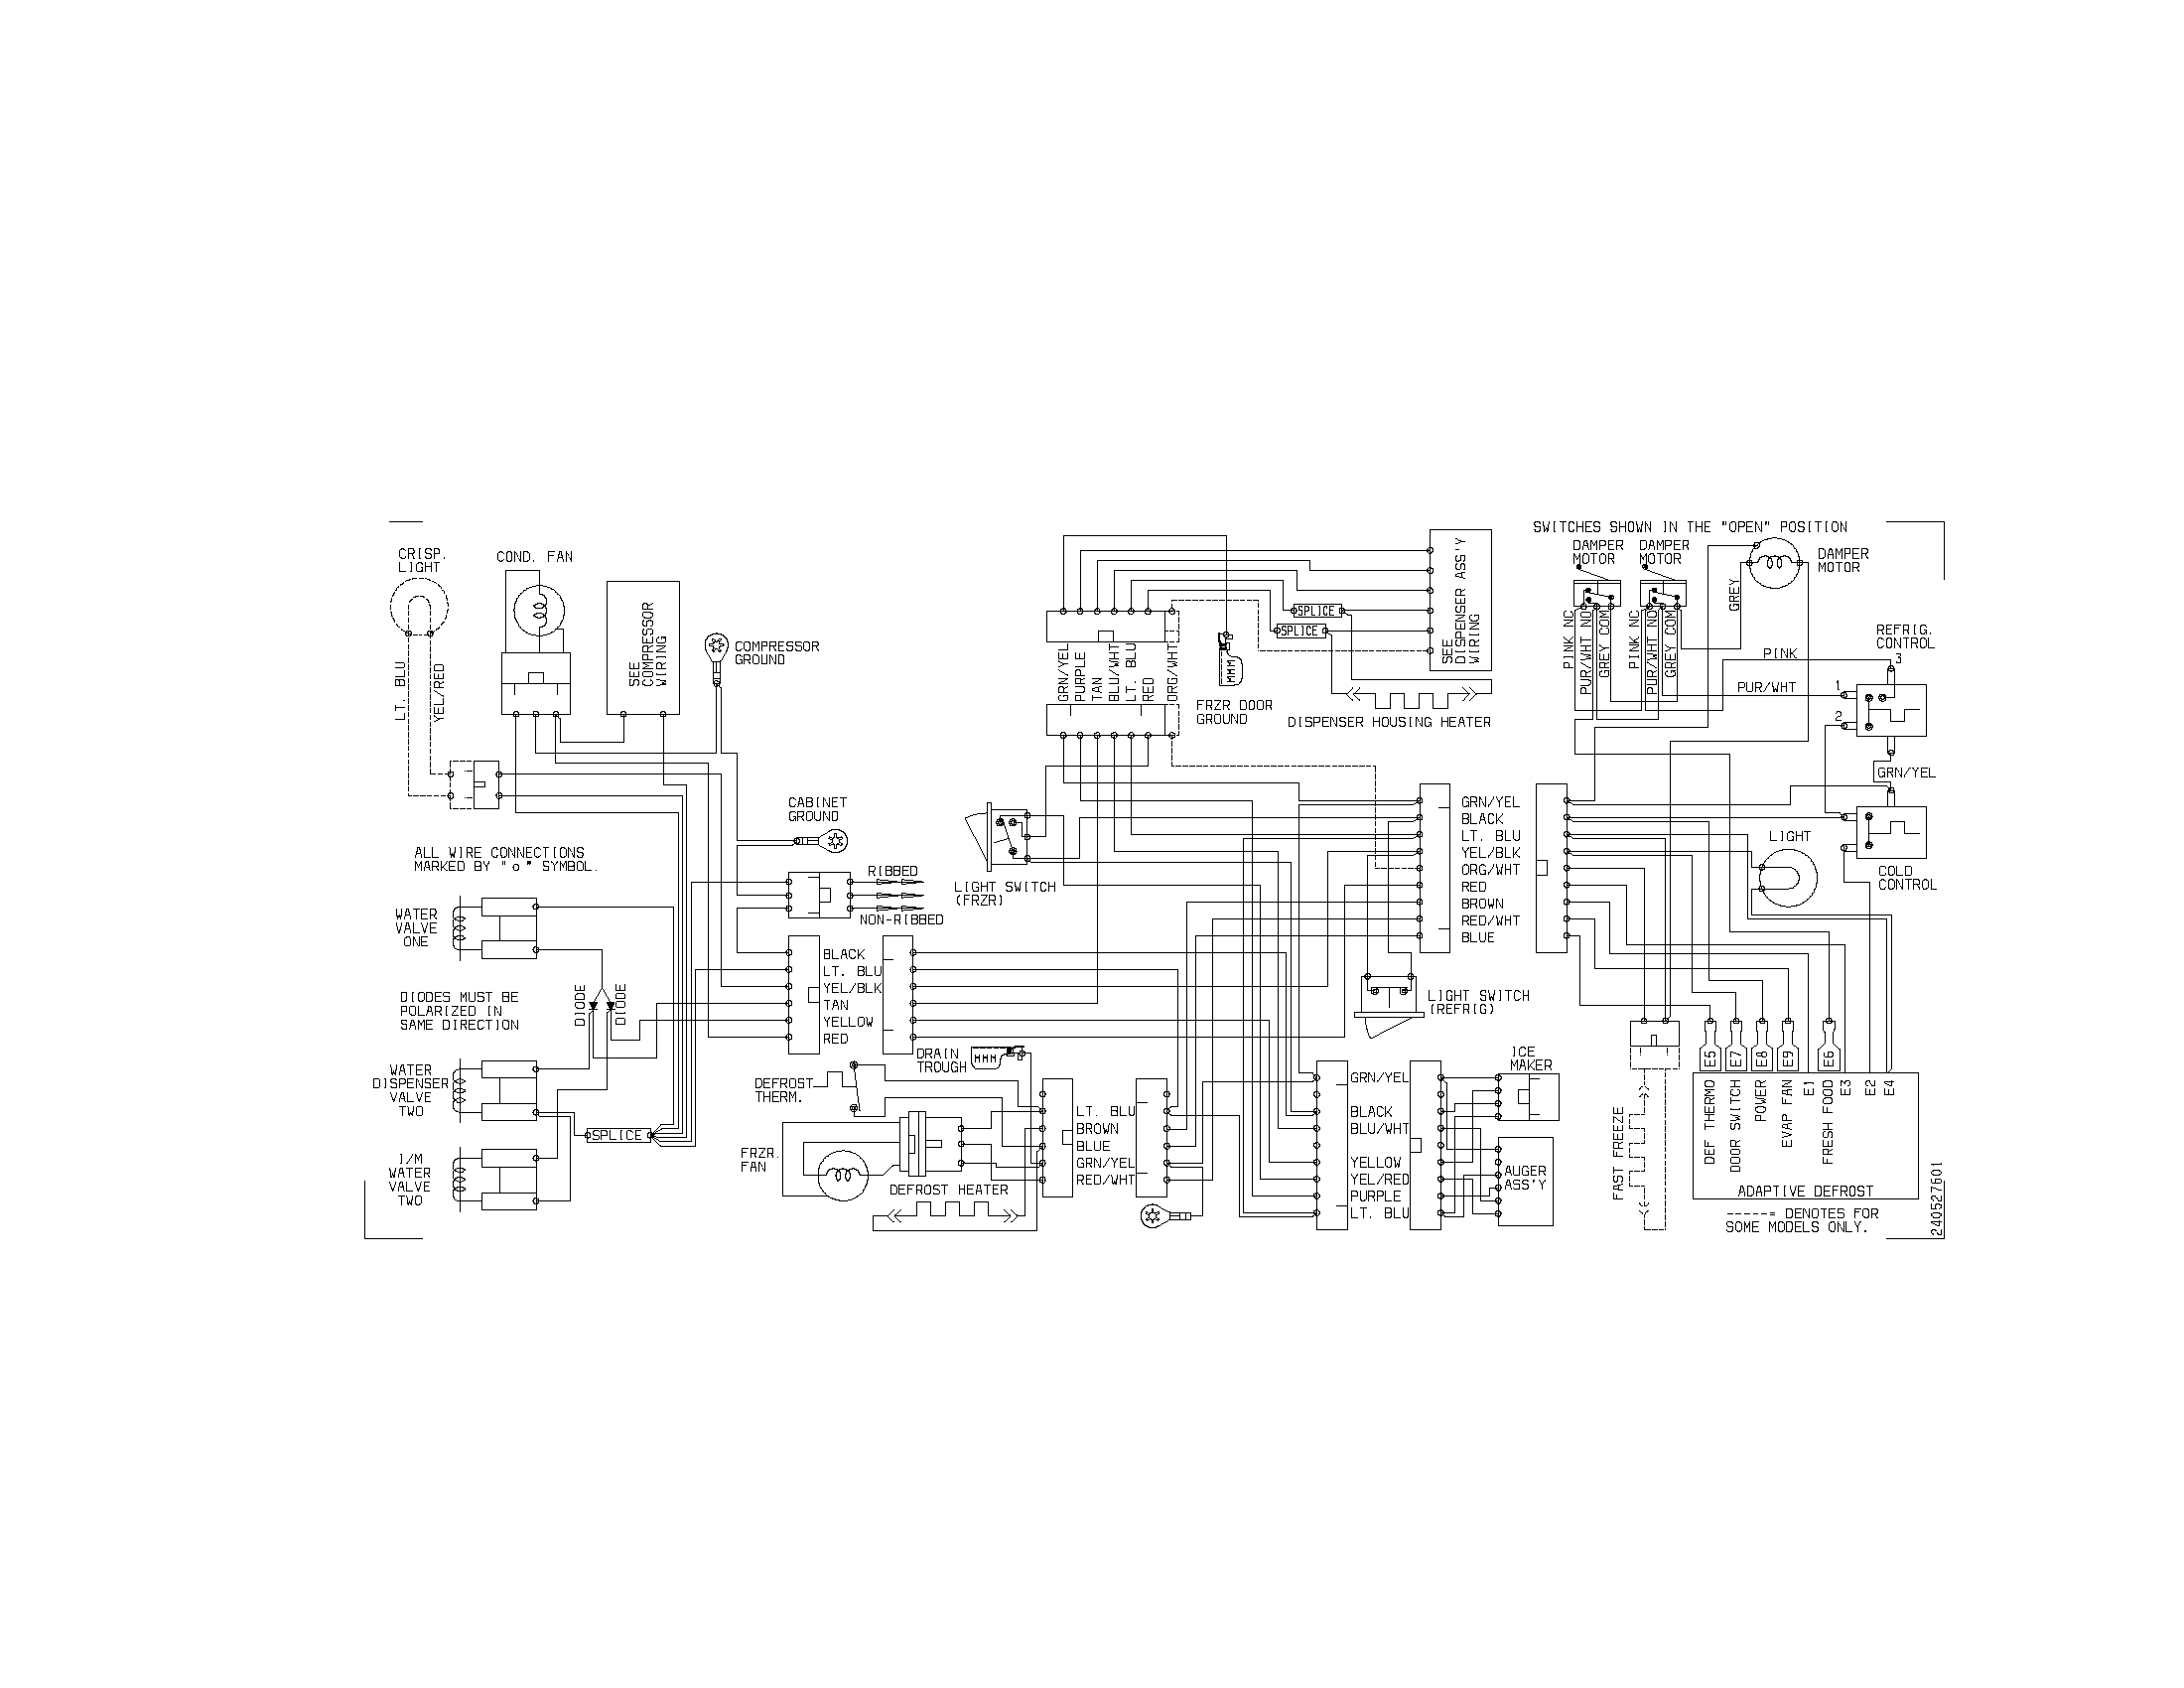 Kenmore model 25353322300 side-by-side refrigerator